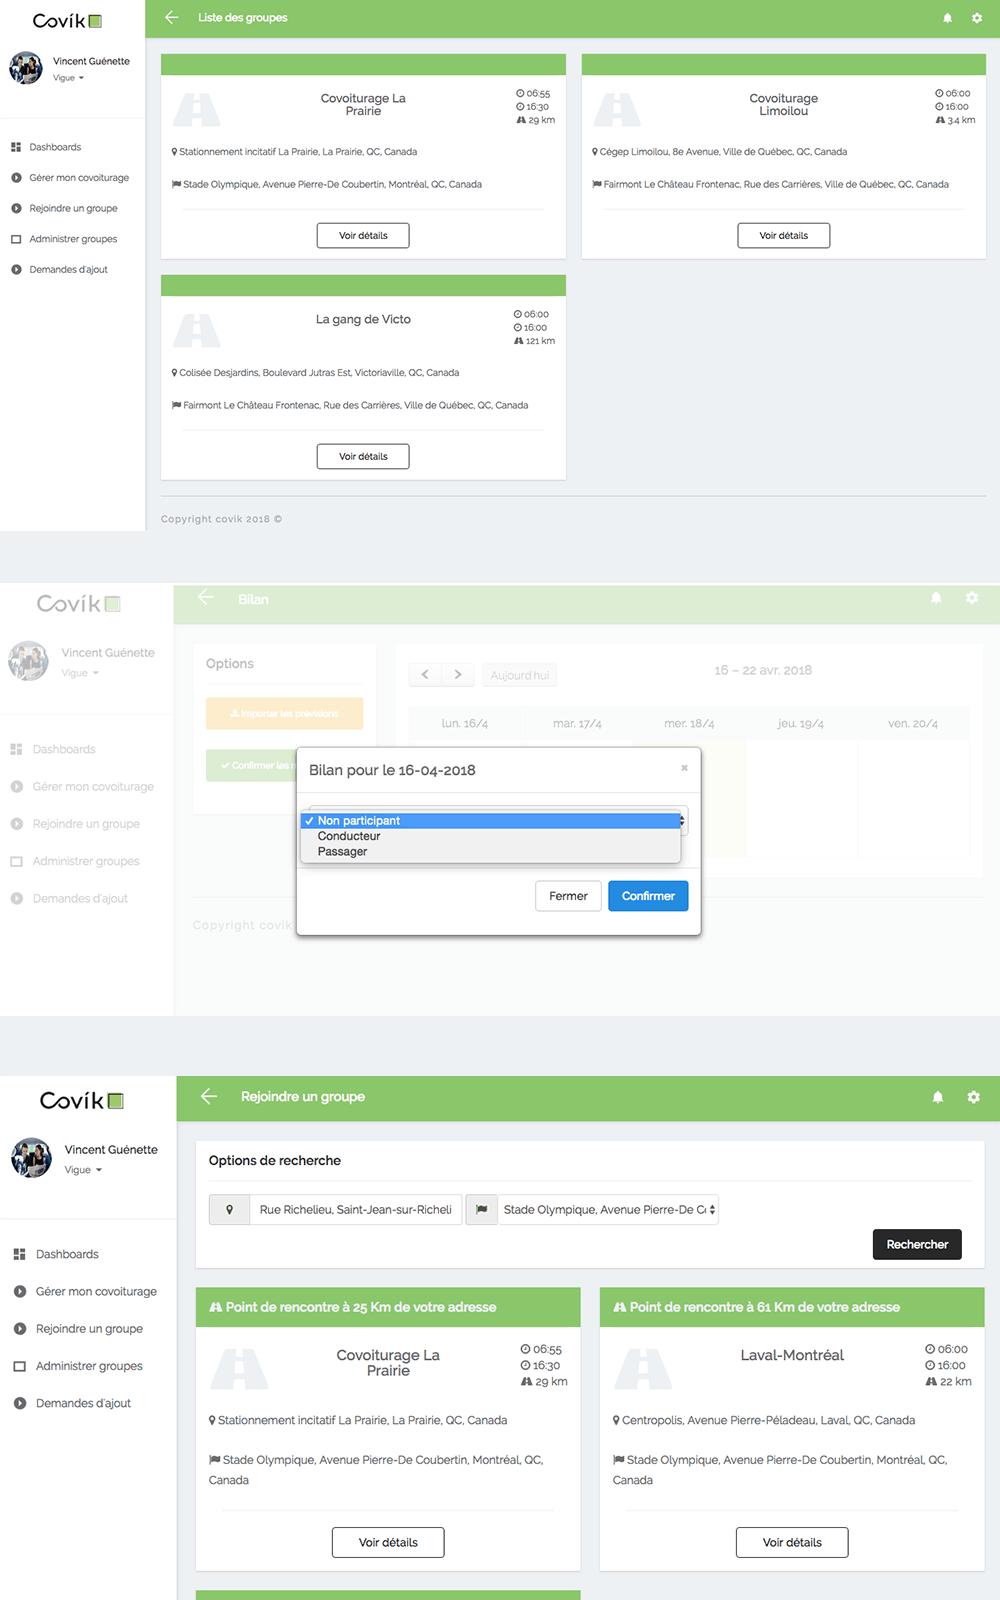 Capture d'écran de l'application Web Covik